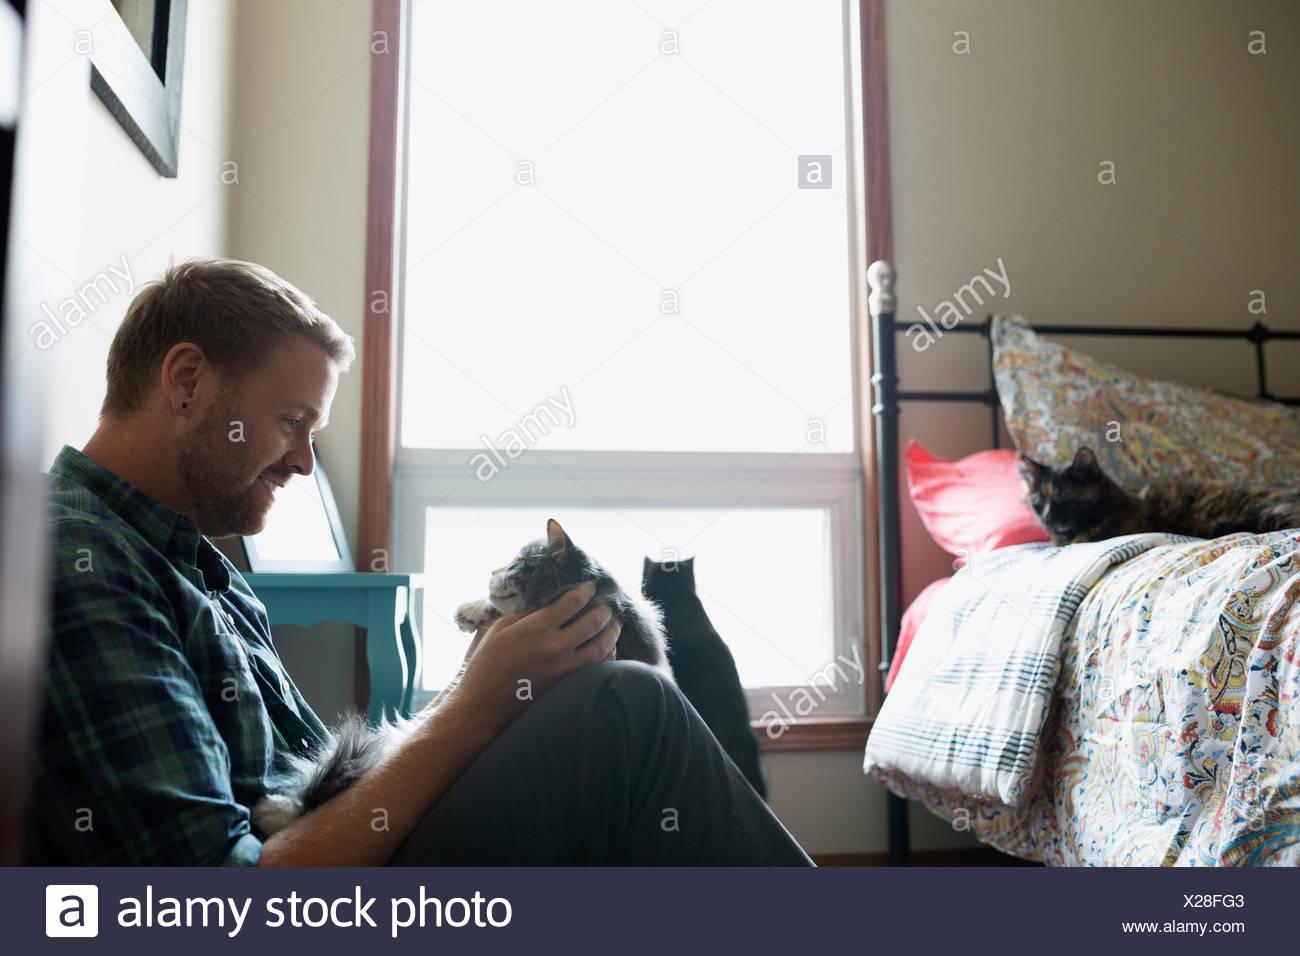 Man petting cat in bedroom - Stock Image